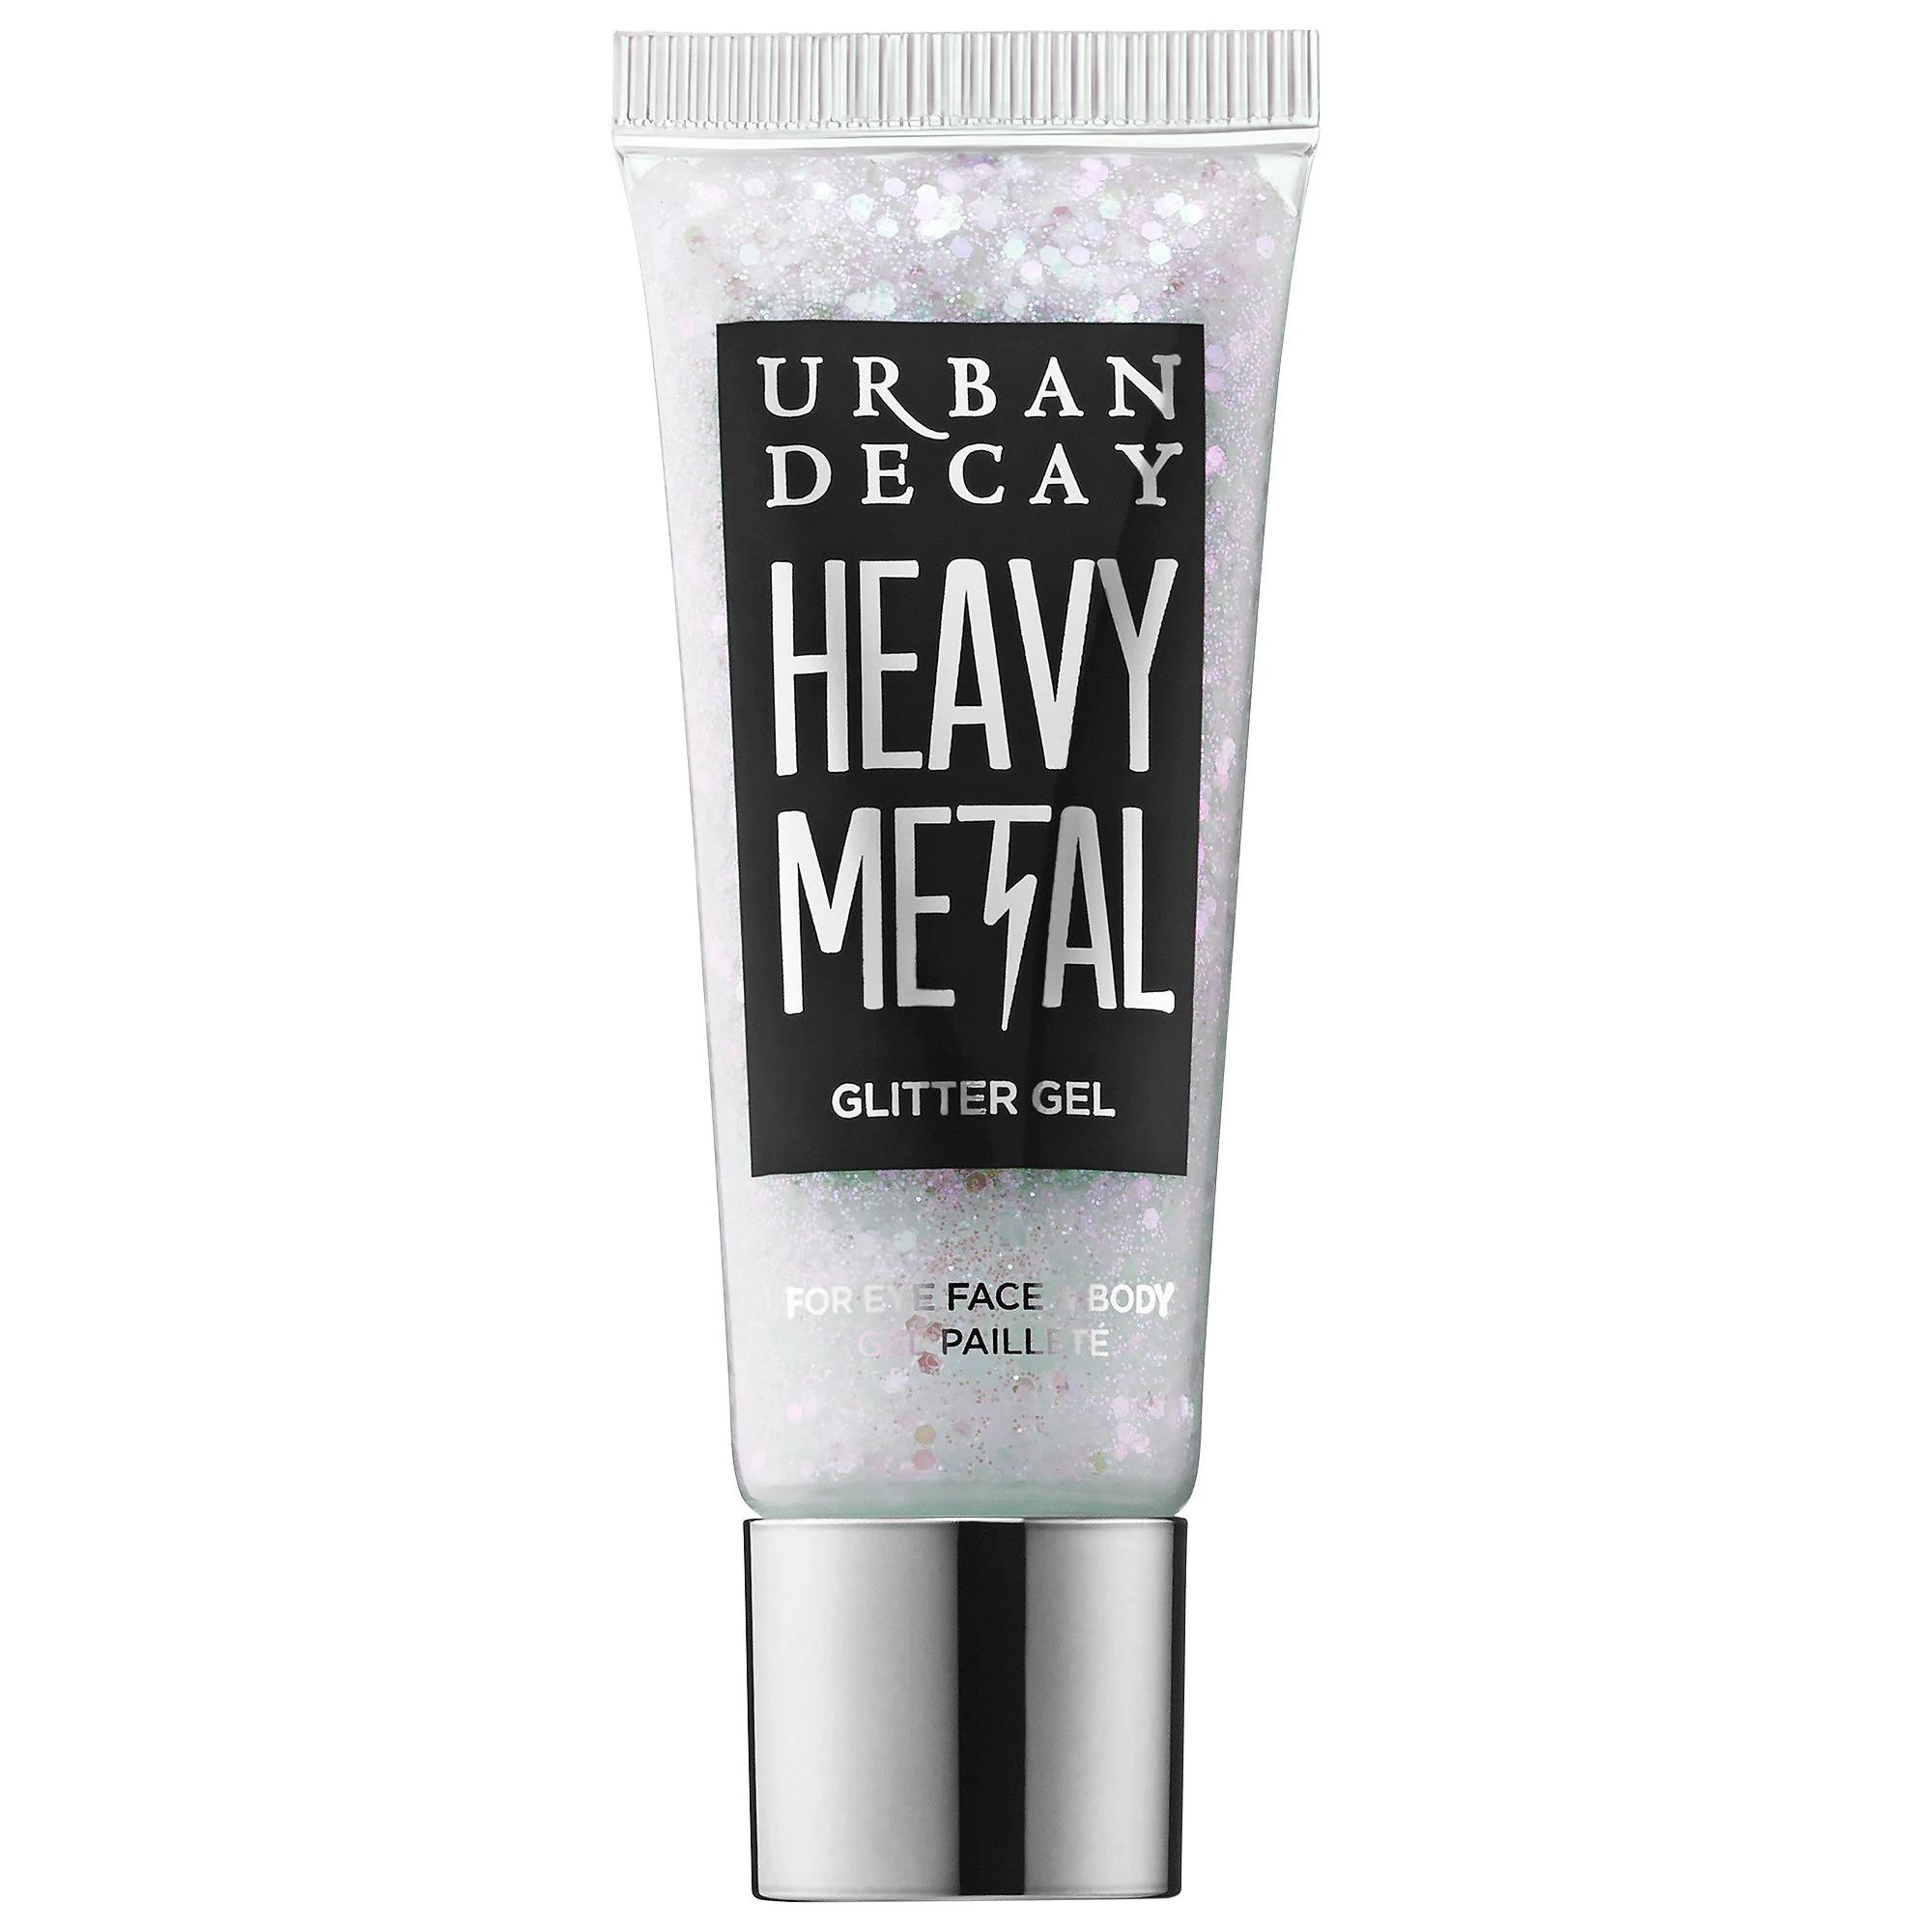 Urban Decay Heavy Metals Face & Body Glitter Gel Distortion